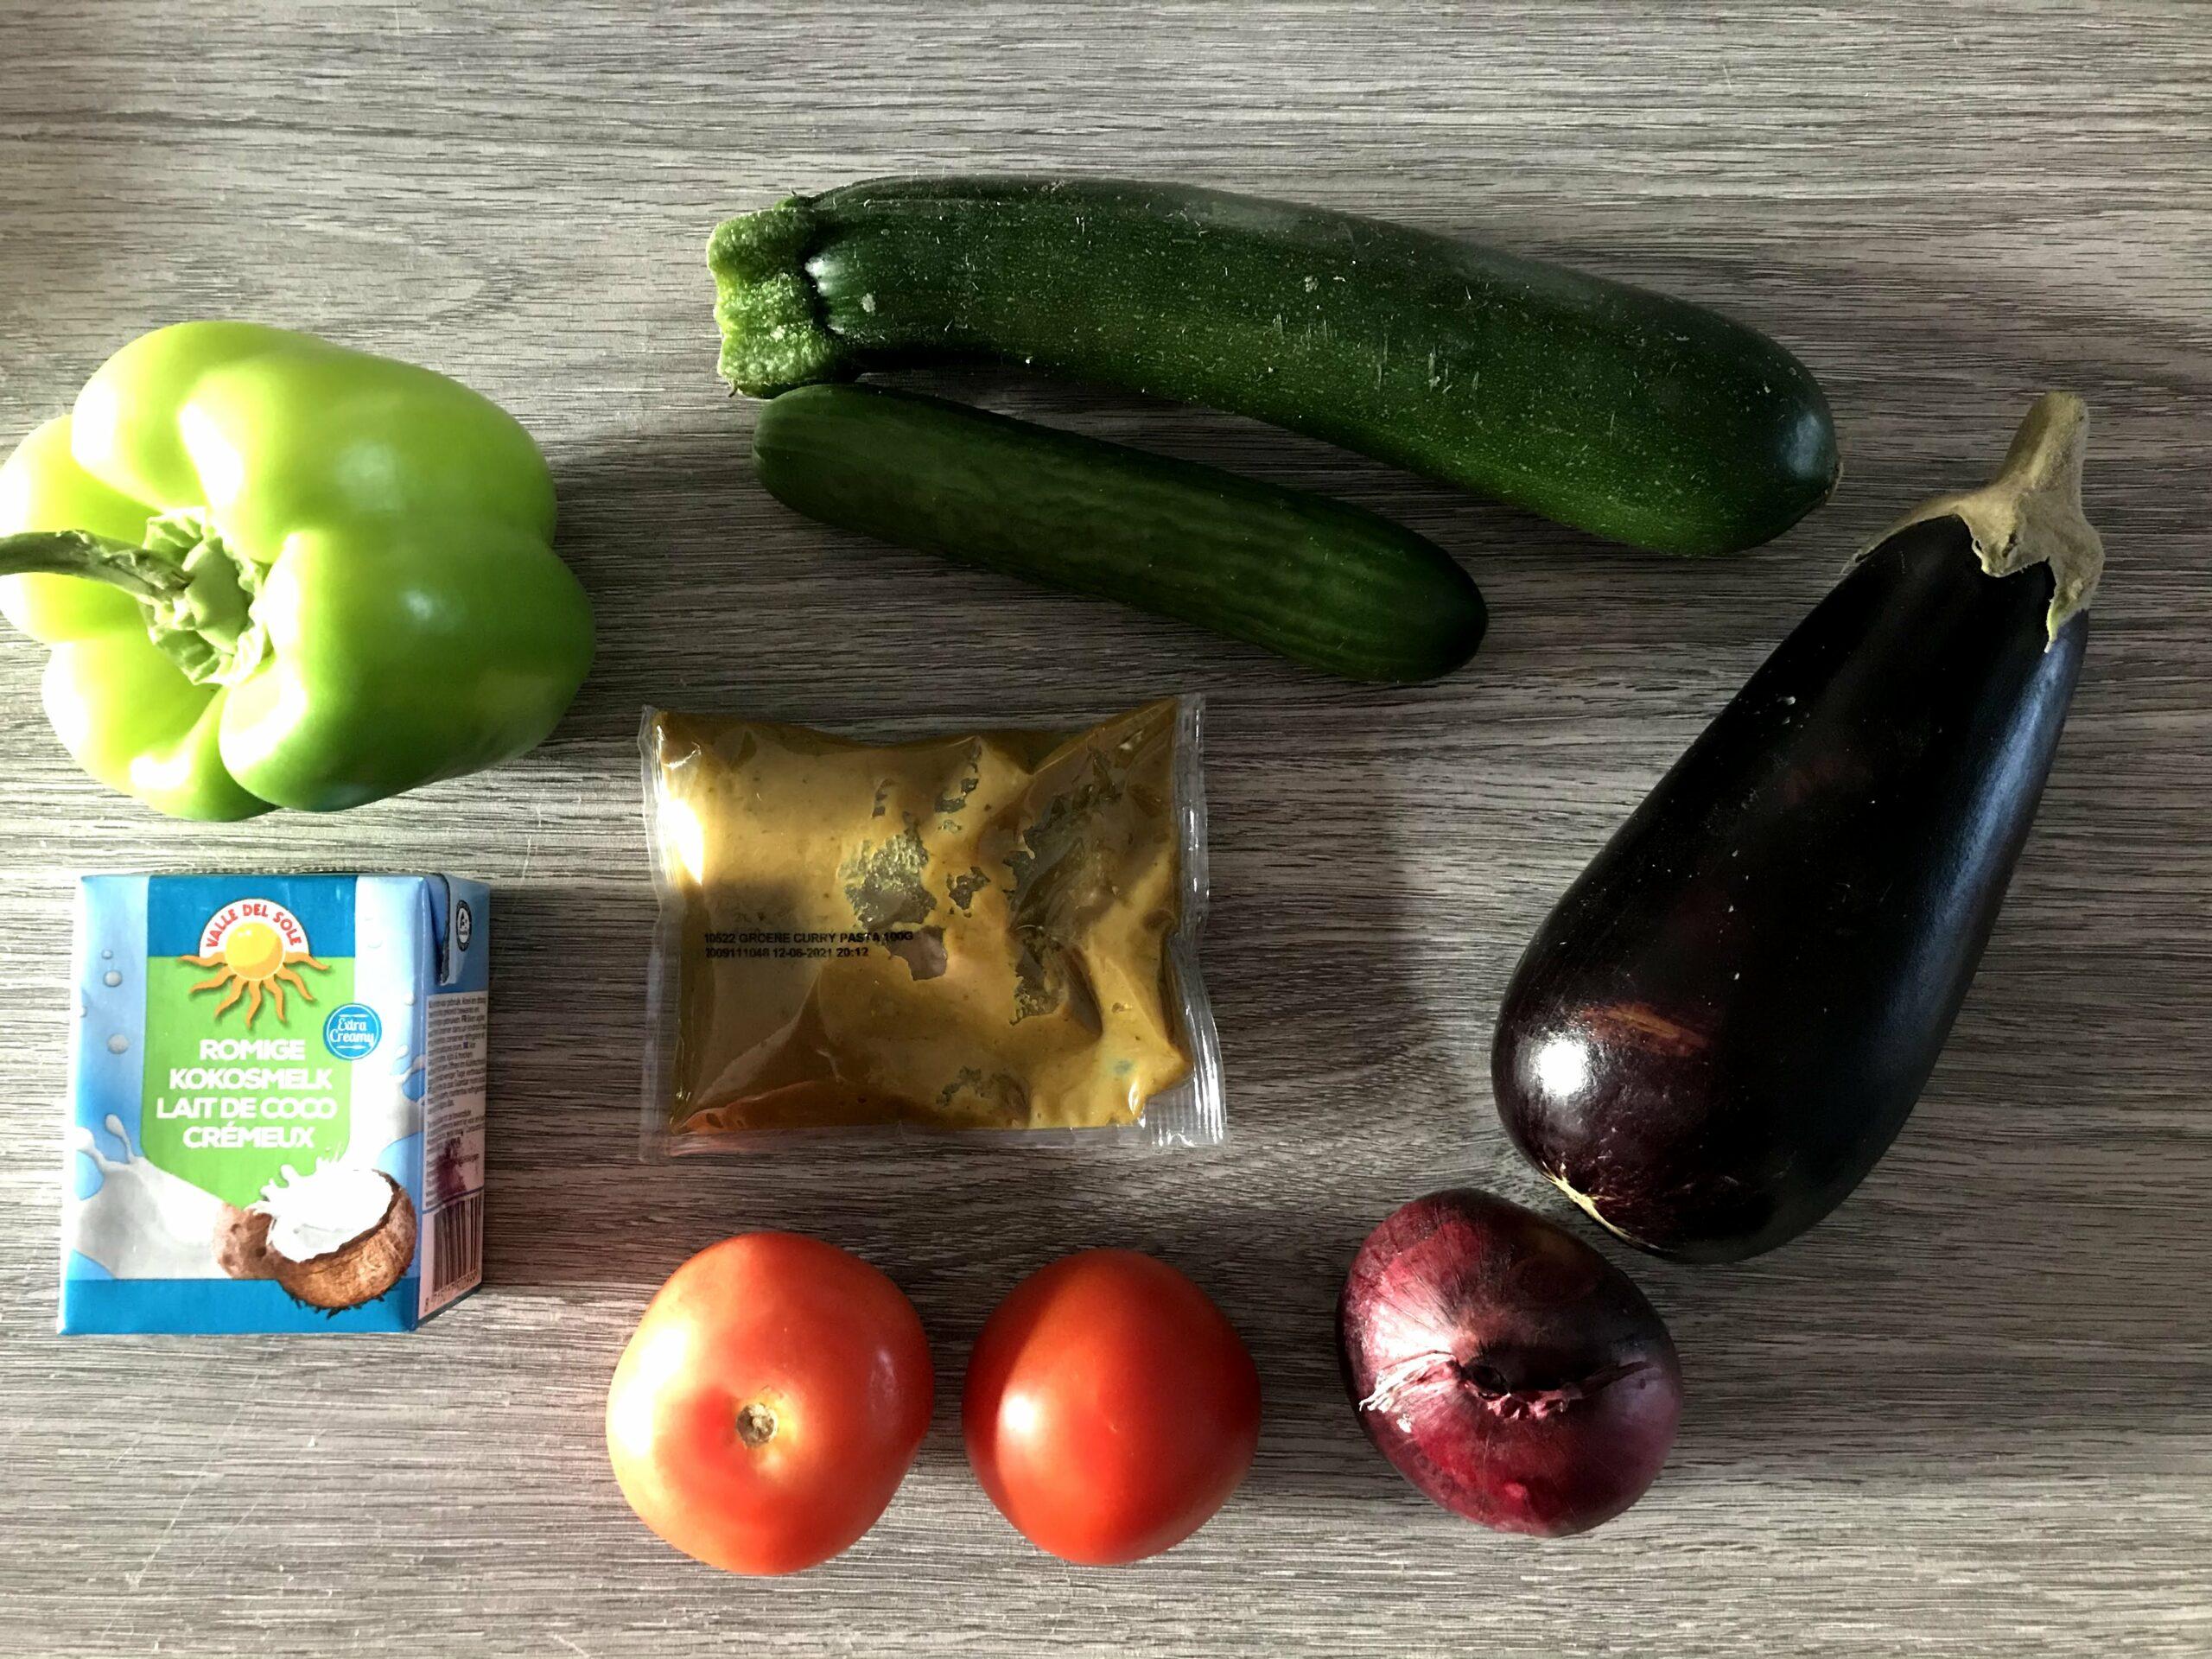 groene curry lidl verspakket